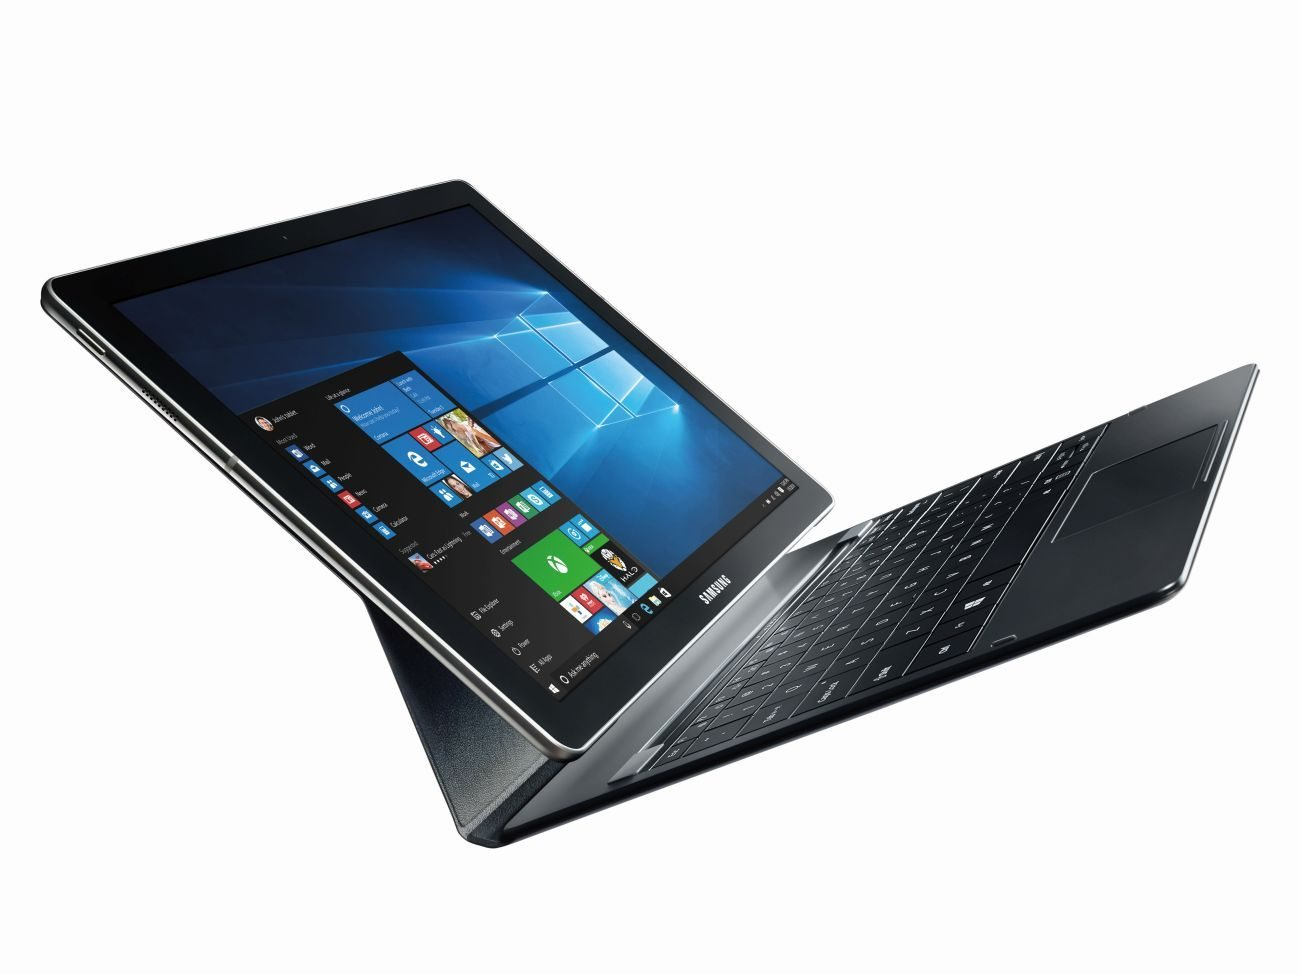 Samsung Galaxy TabPro S - Key Visual (ATL)